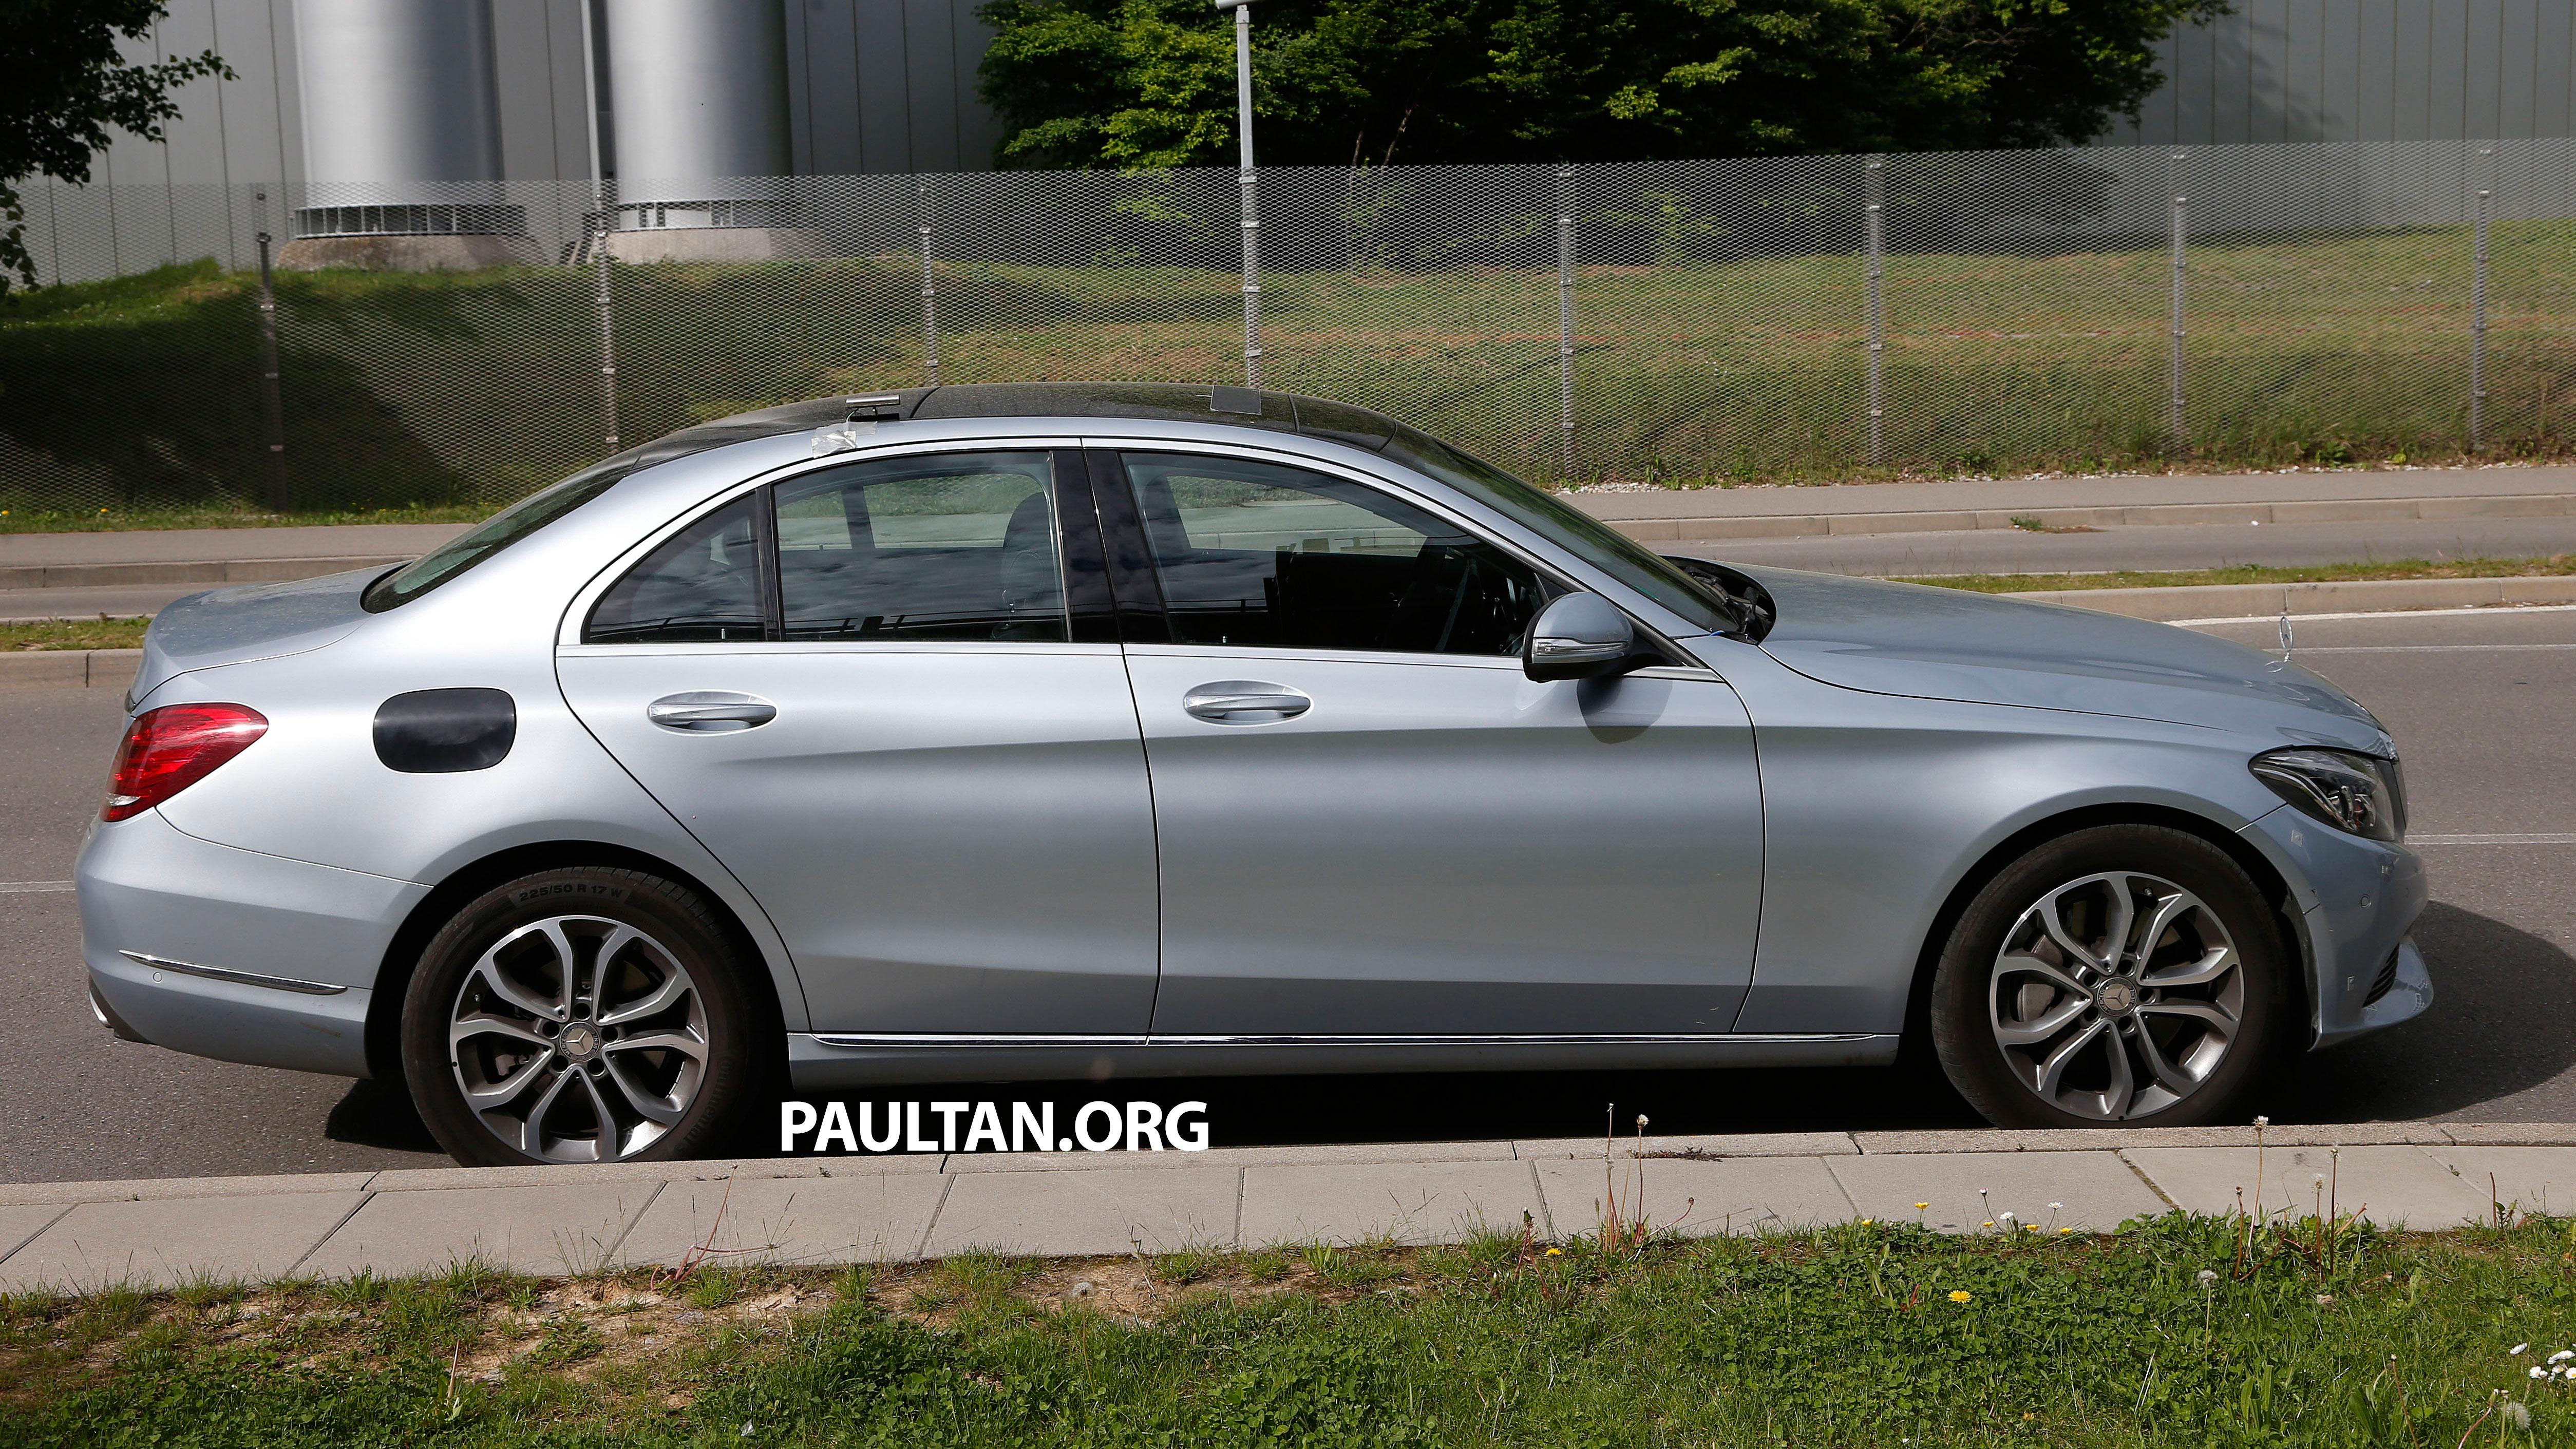 Spyshots mercedes benz c class plug in hybrid paul tan for Mercedes benz c class hybrid